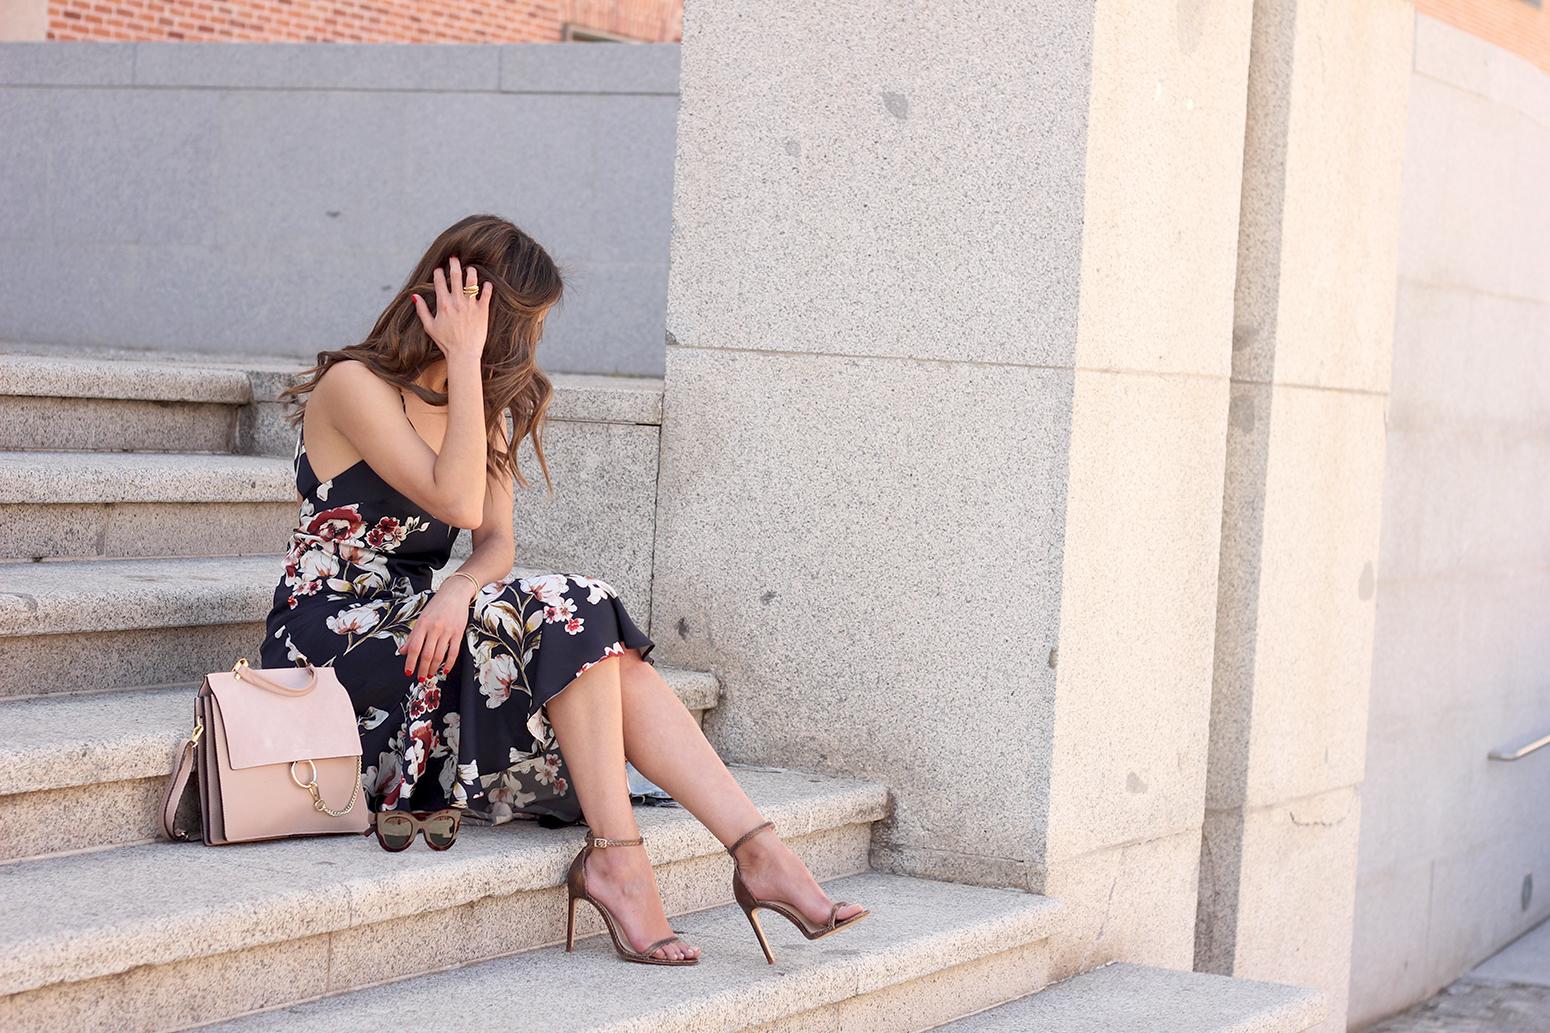 Floral dress denim jacket heels spring outfit style fashion14